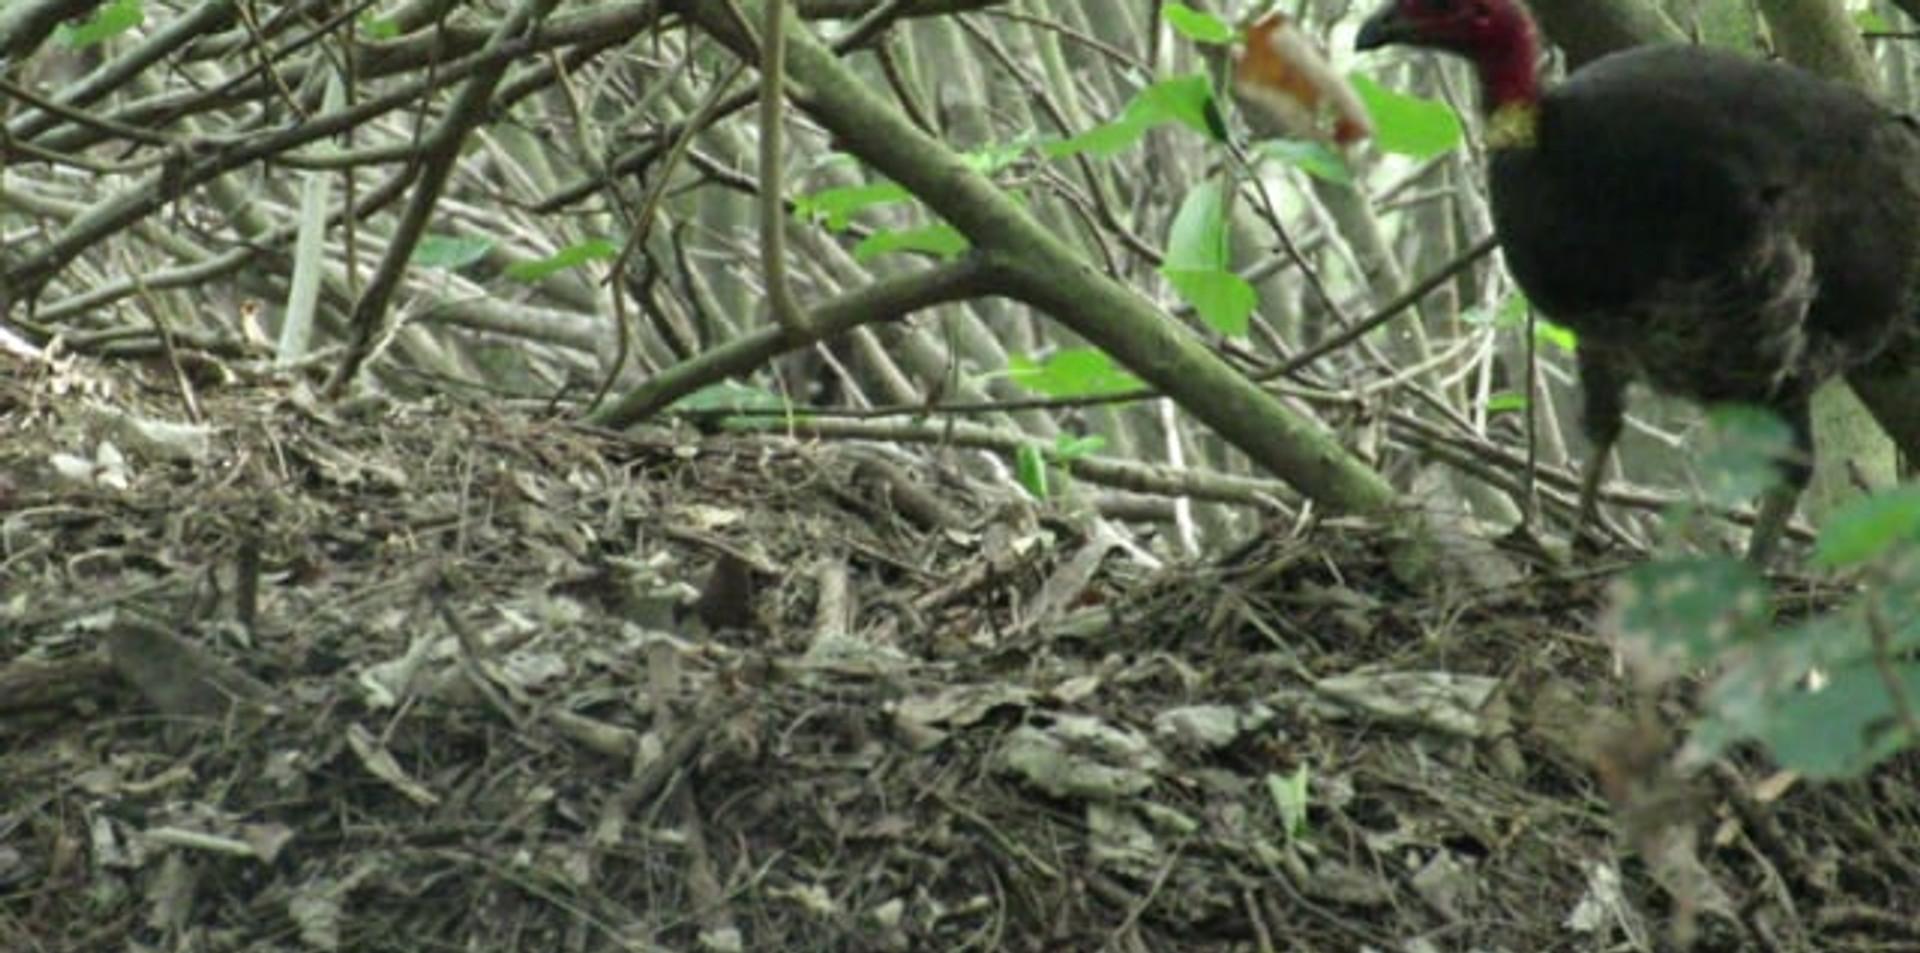 Adult female Australian Brush Turkey digging into mound